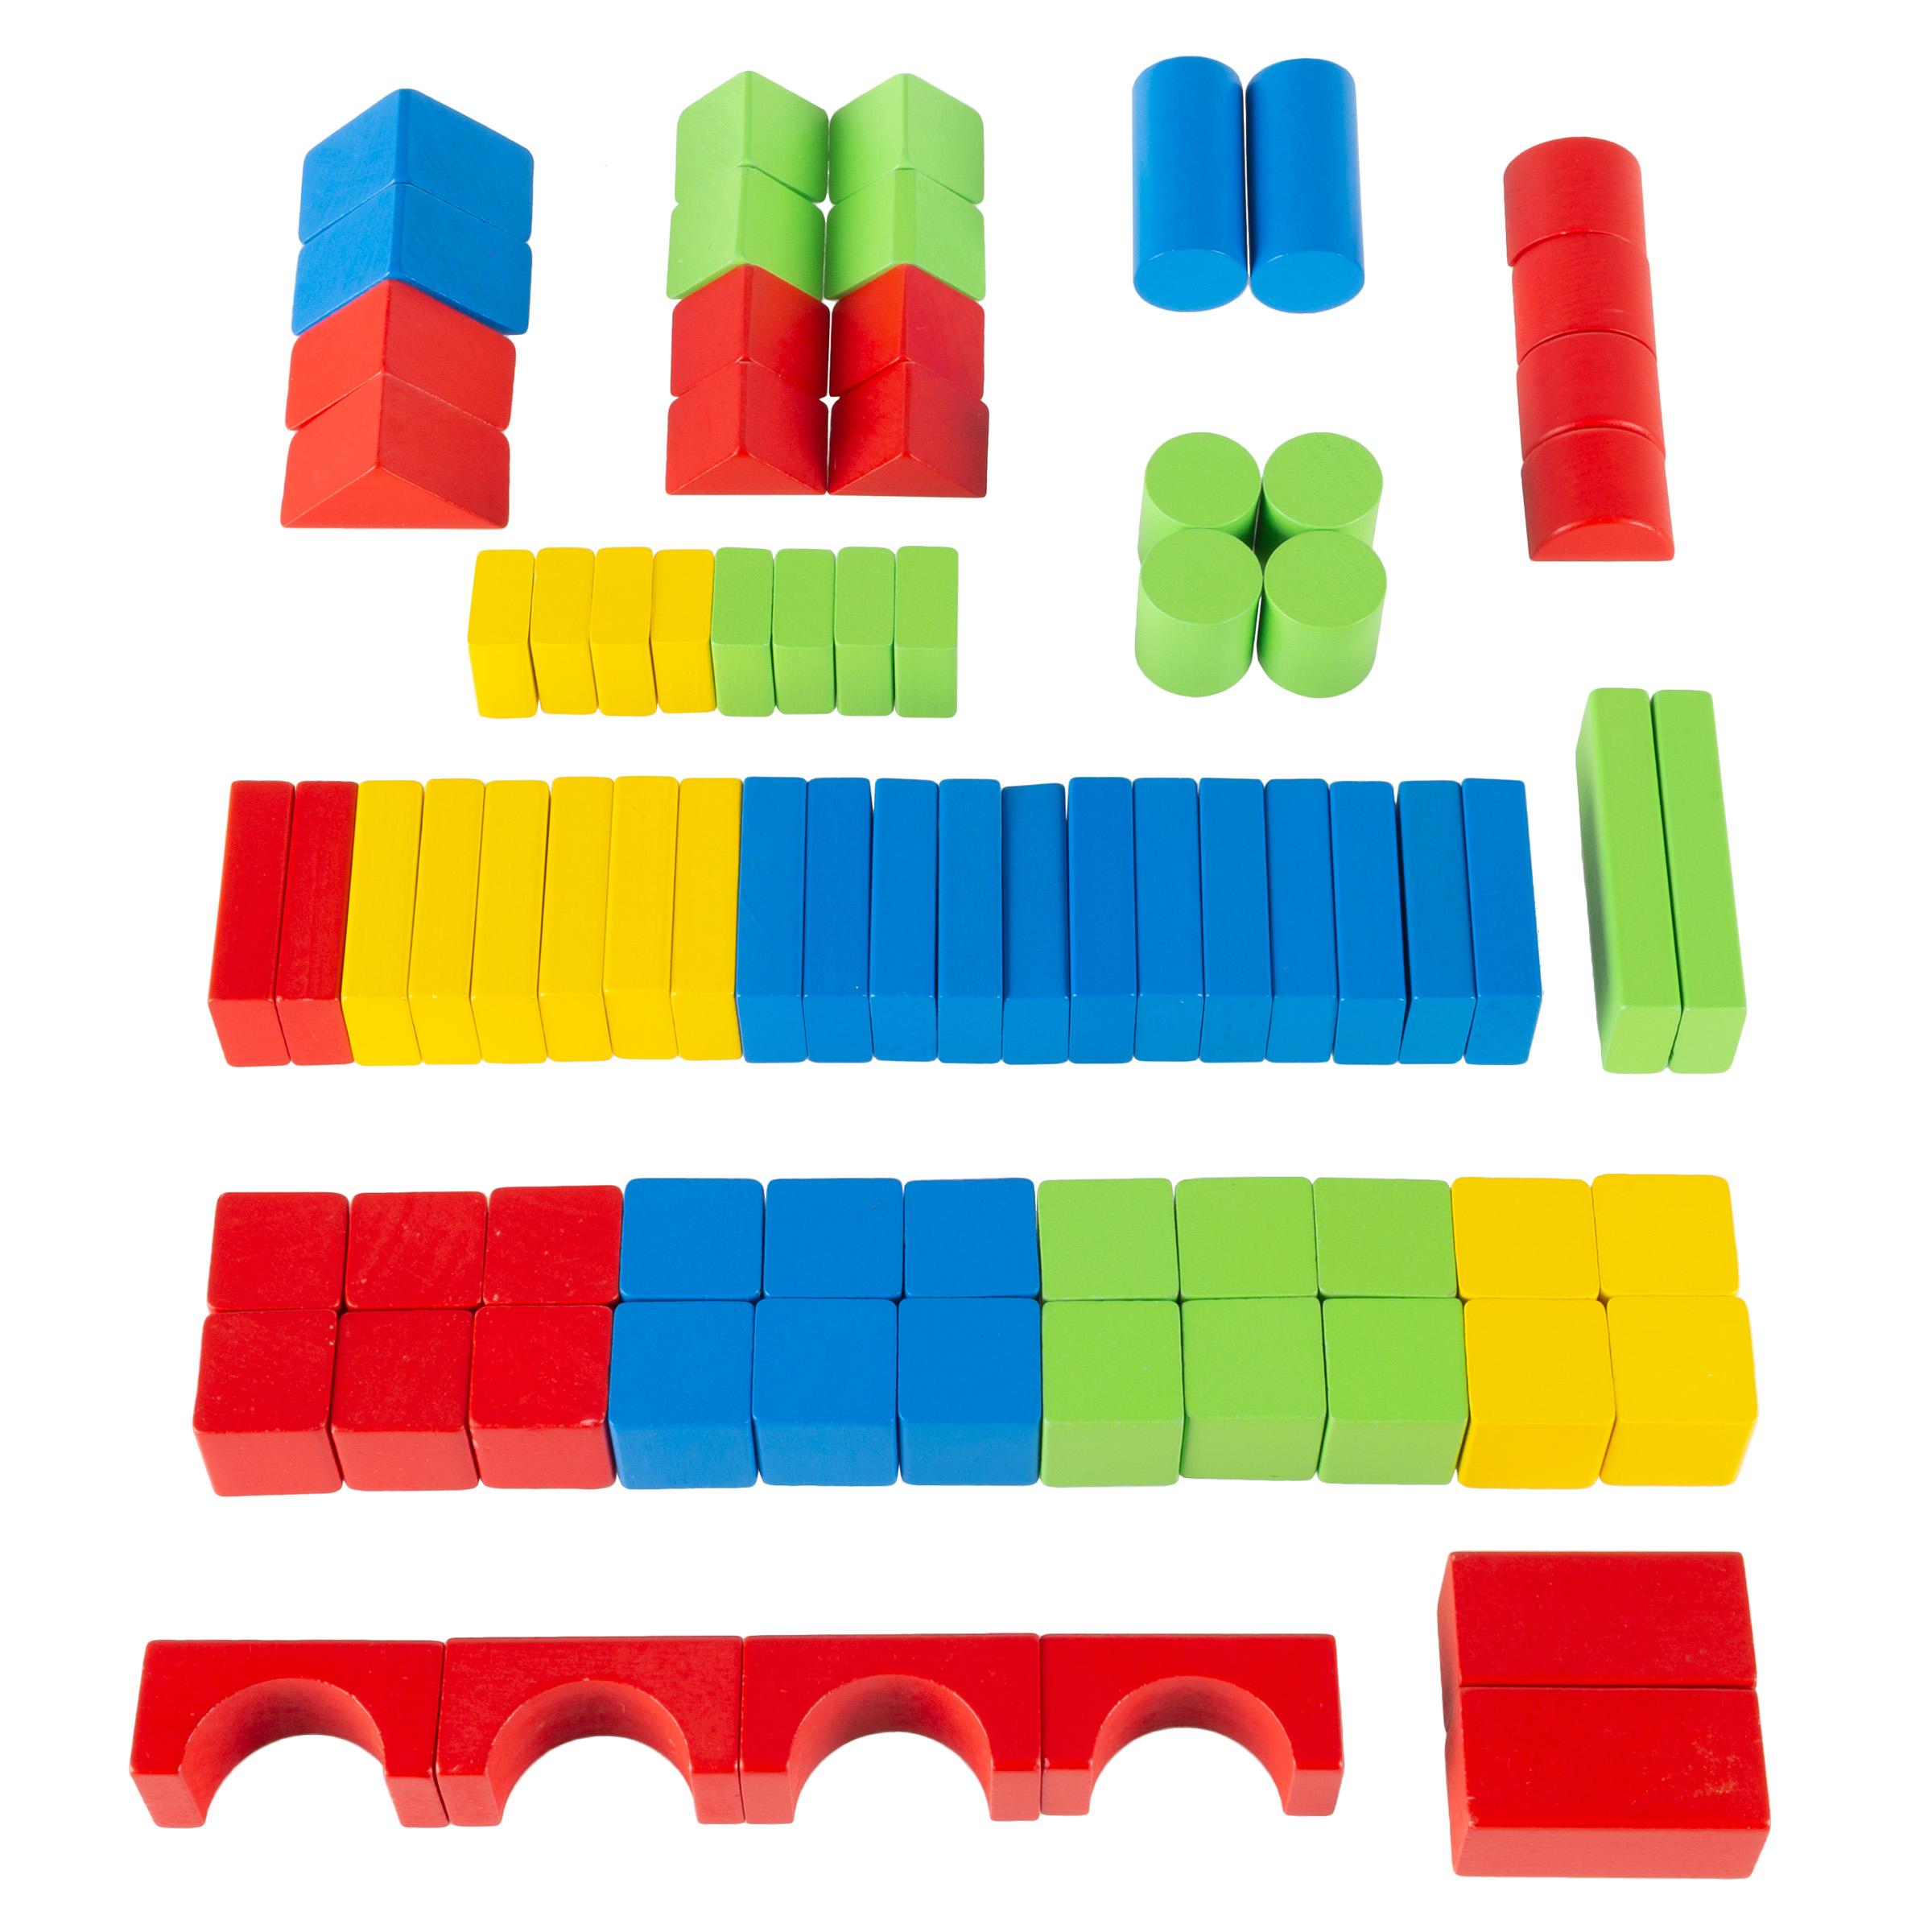 80-Piece Hey! Play! Wooden Blocks Classic Building Set w/ Storage Bag $8.99 + Free S/H on $35+